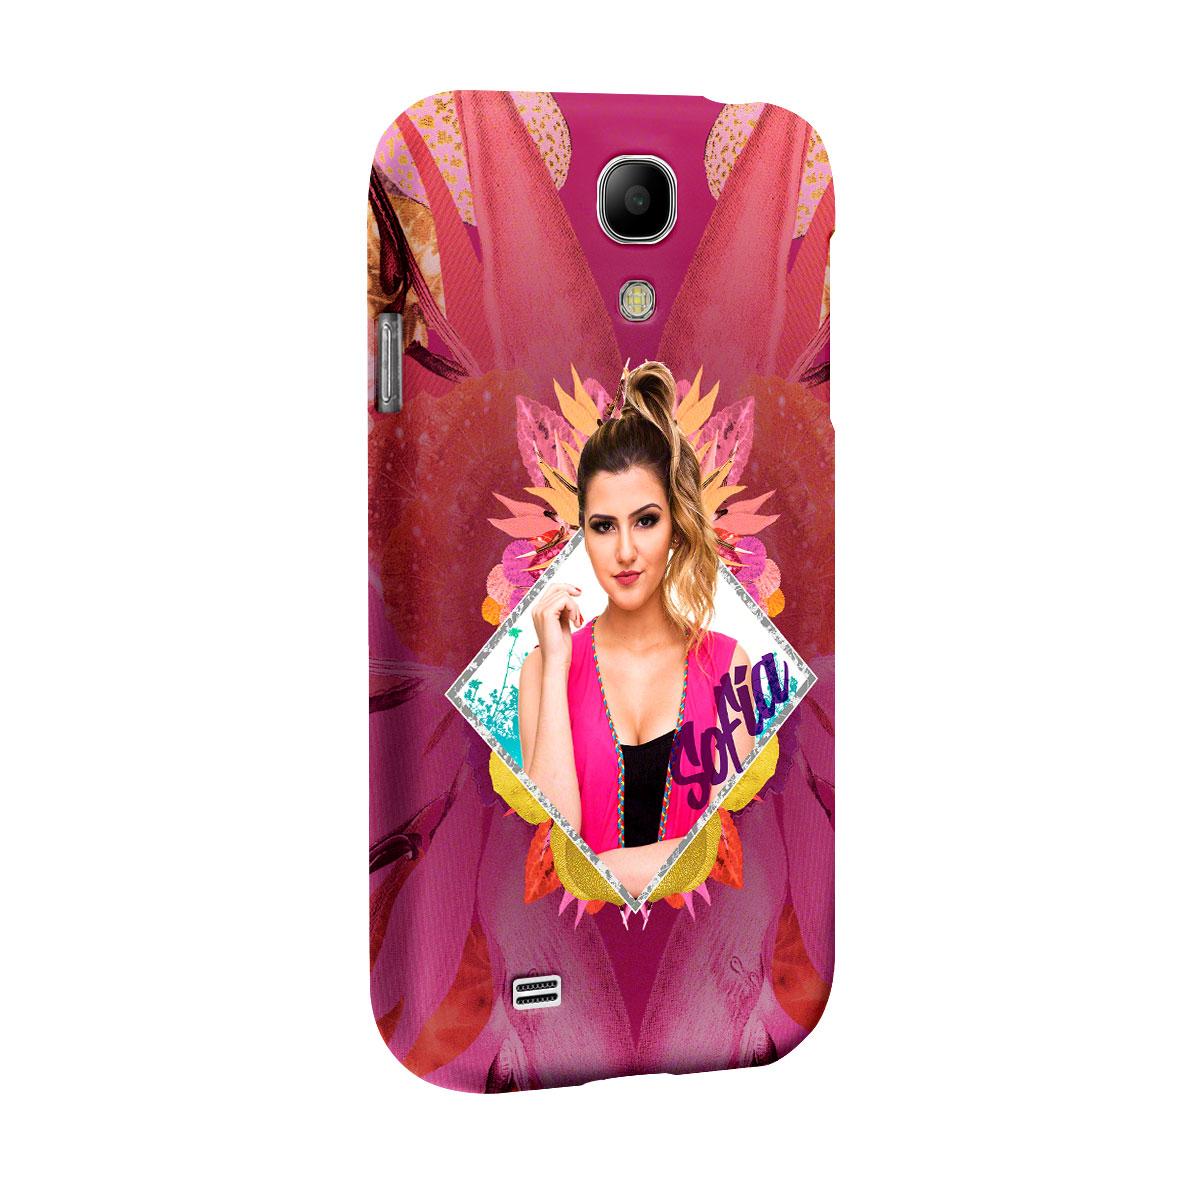 Capa para Samsung Galaxy S4 Sofia Oliveira Foto